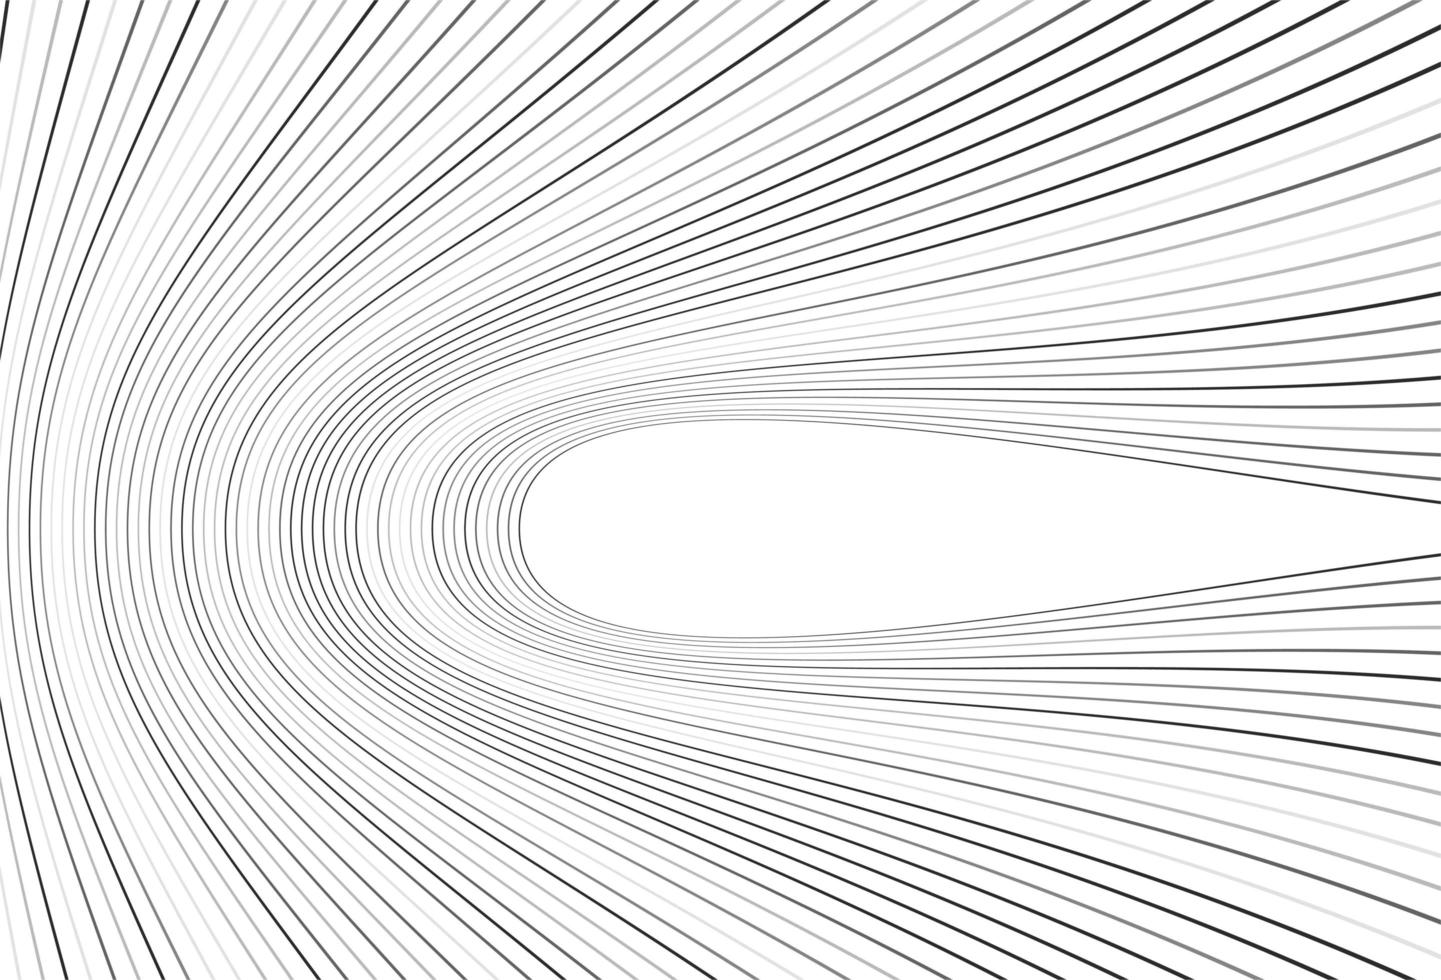 modernes graues gefaltetes Linienmuster vektor